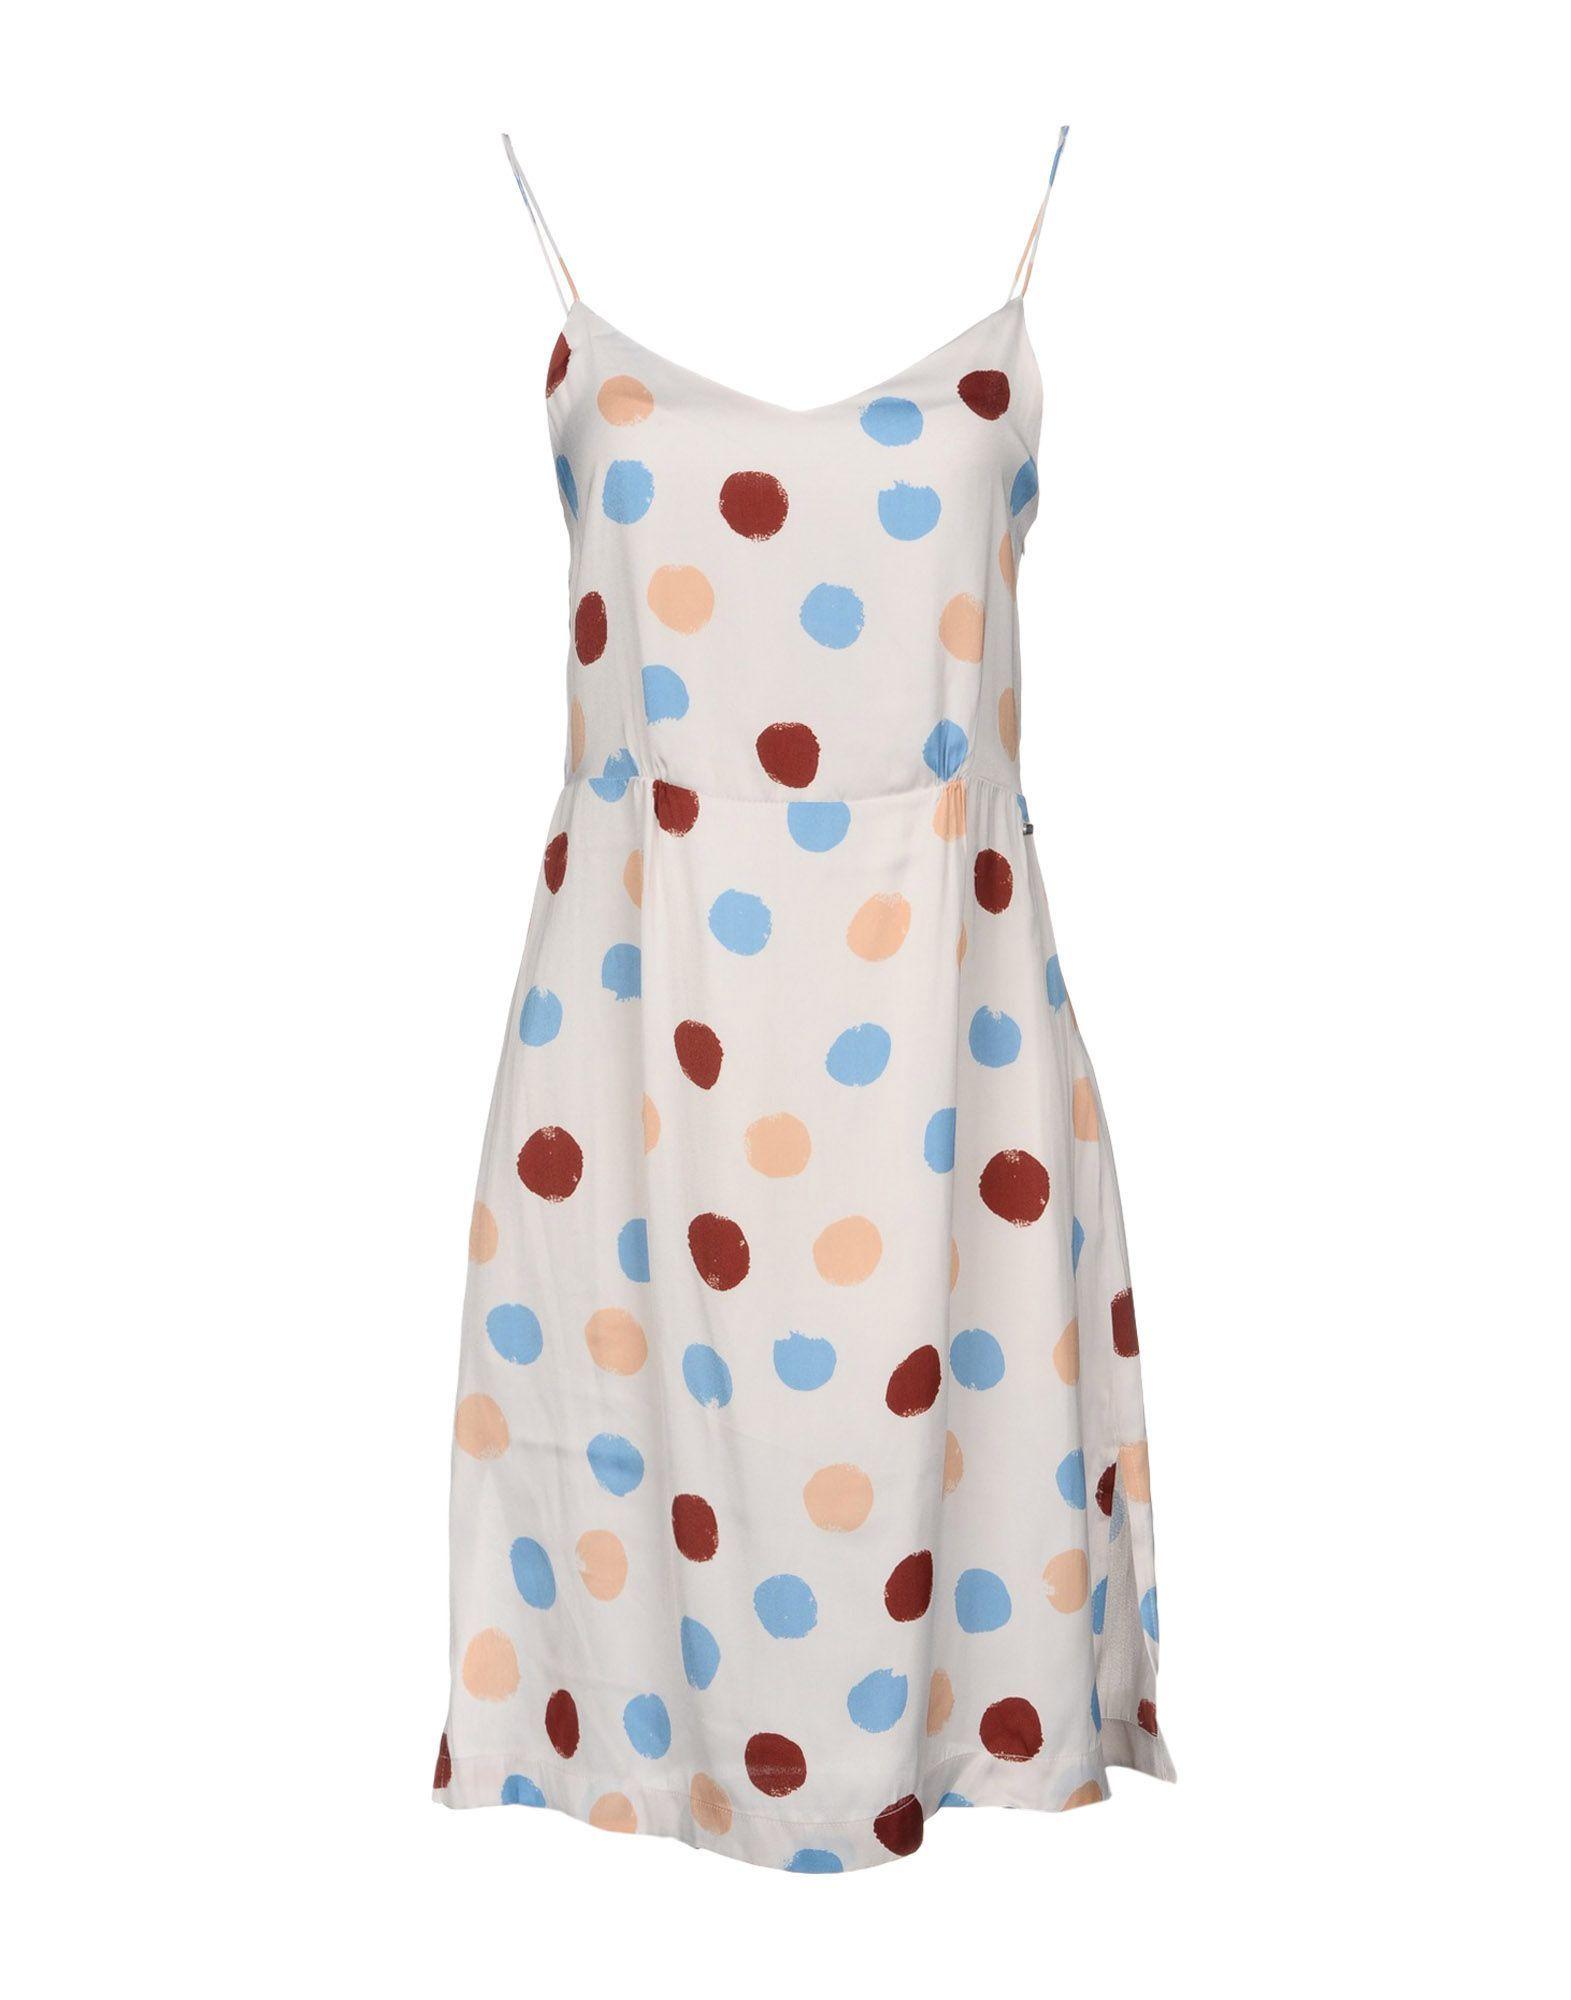 Pepe Jeans Light Grey Spot Print Camisole Dress